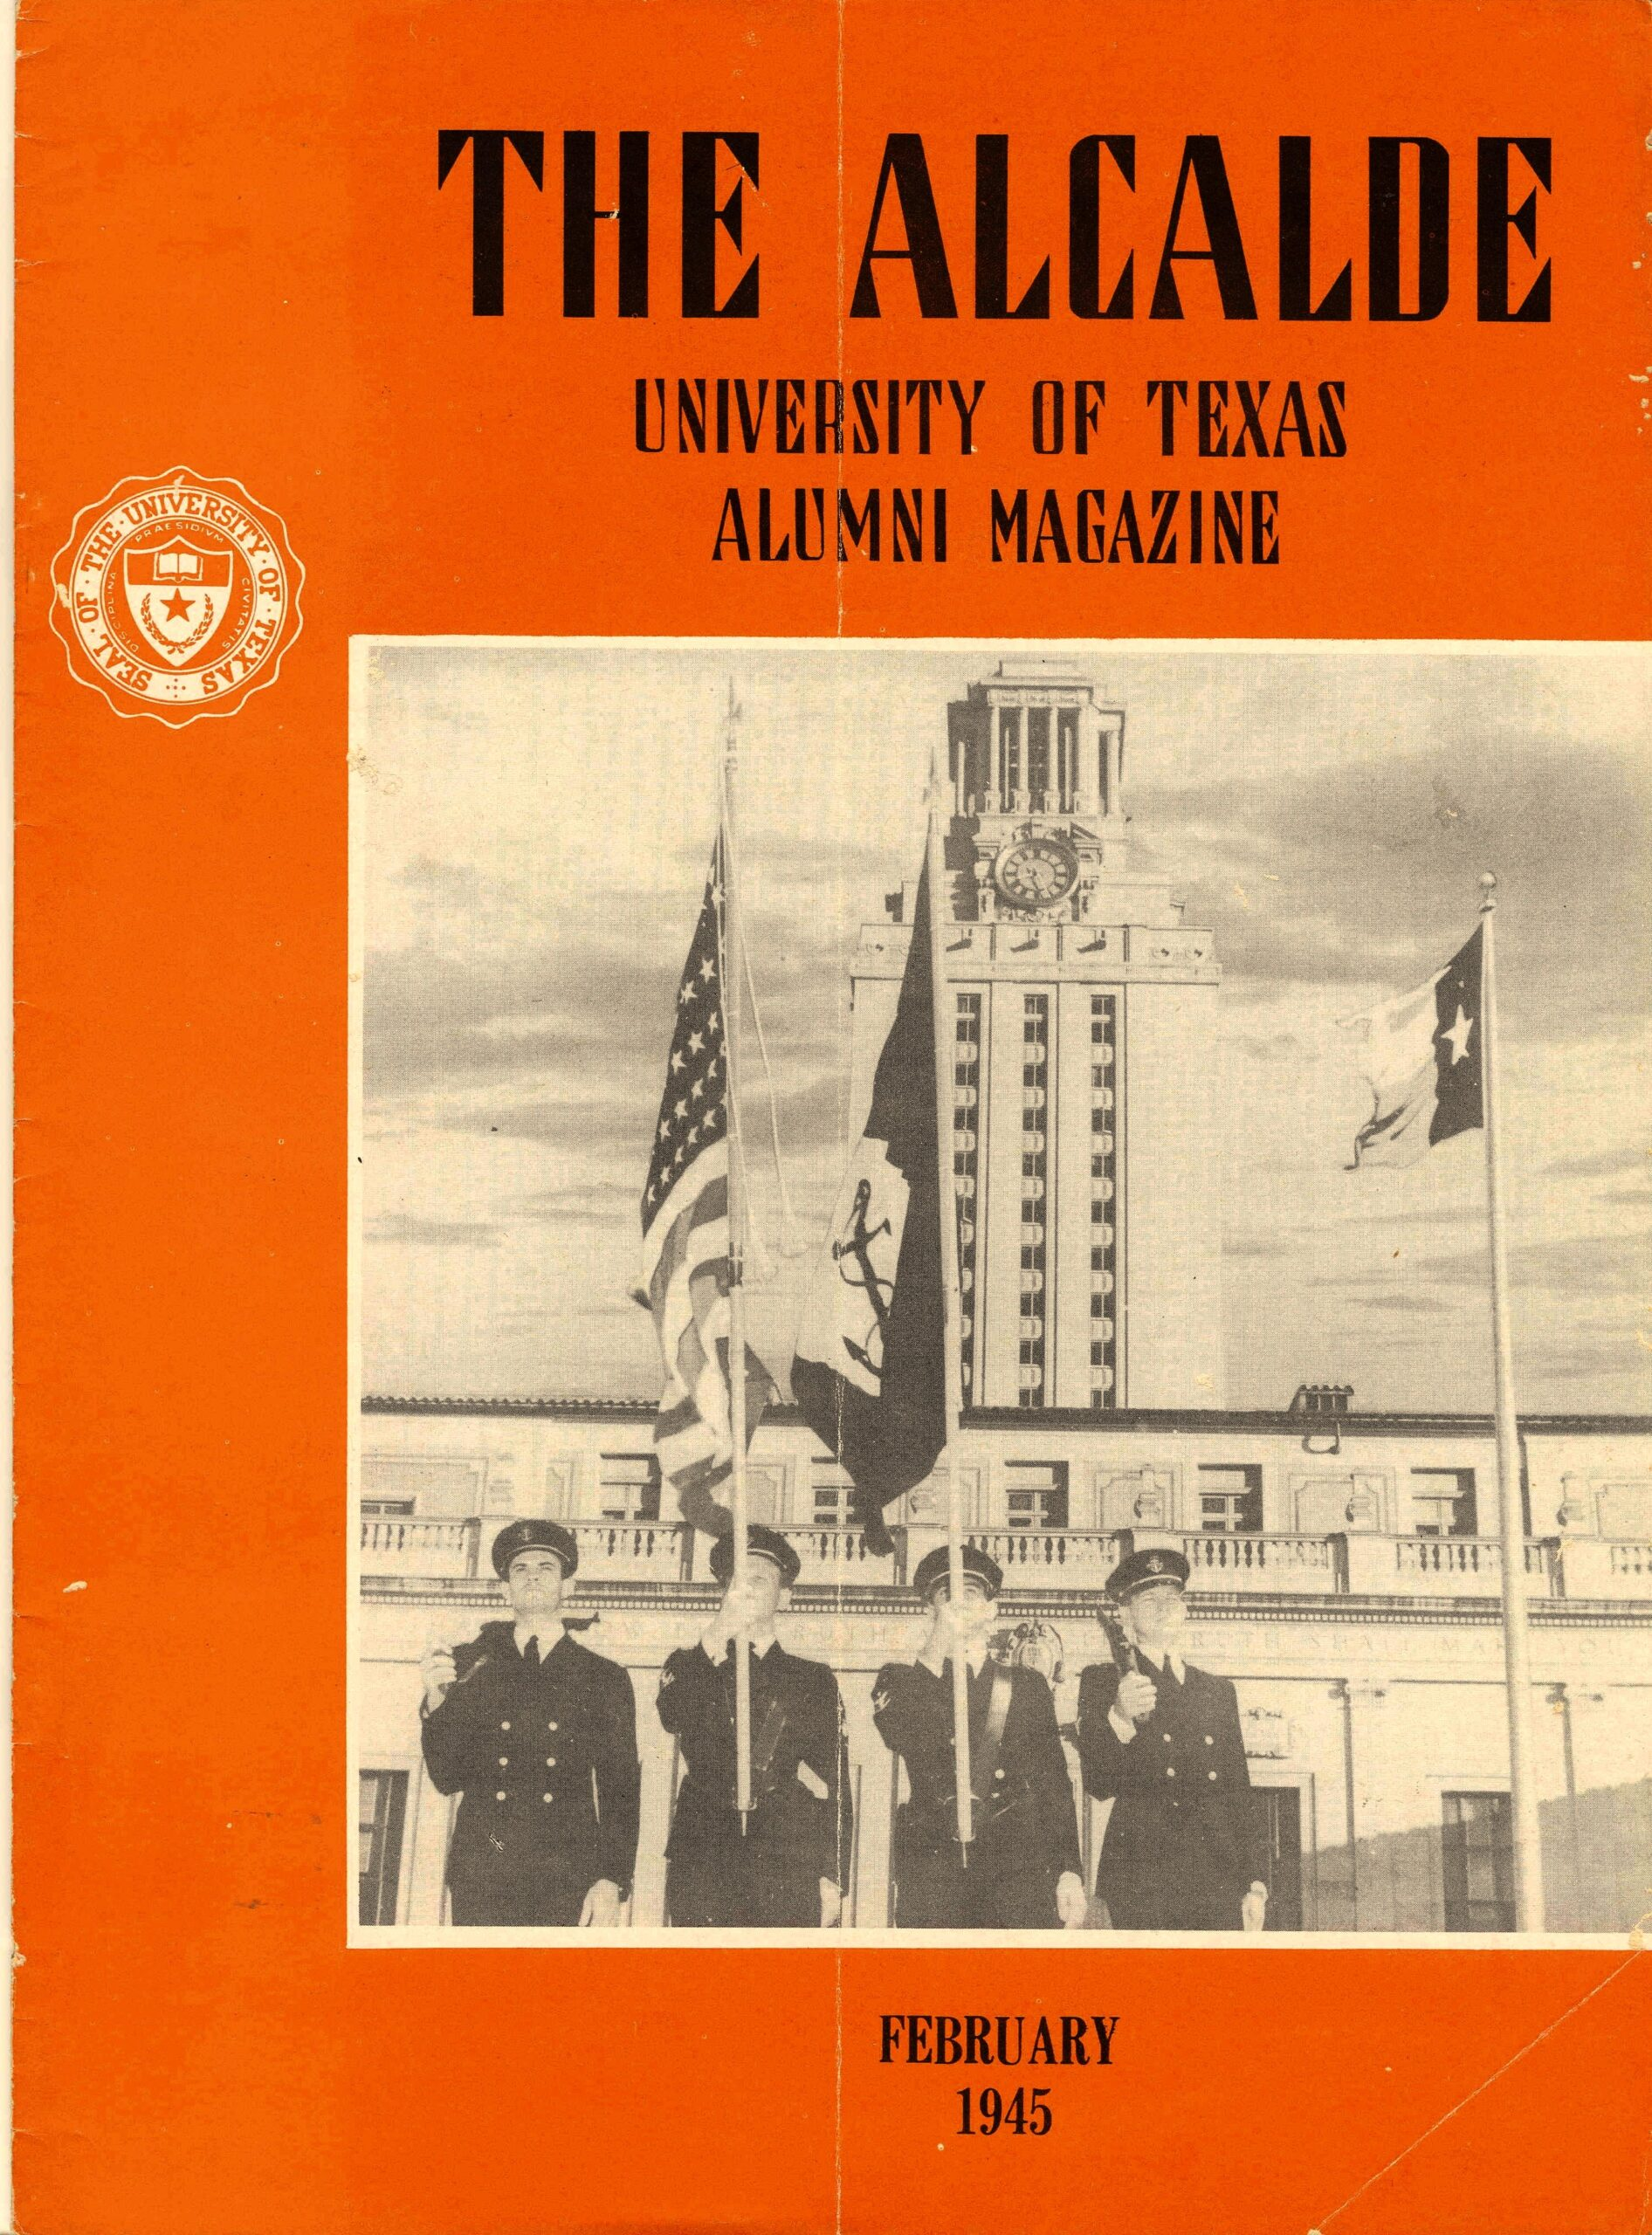 Cover of the Alcalde Magazine, February 1945